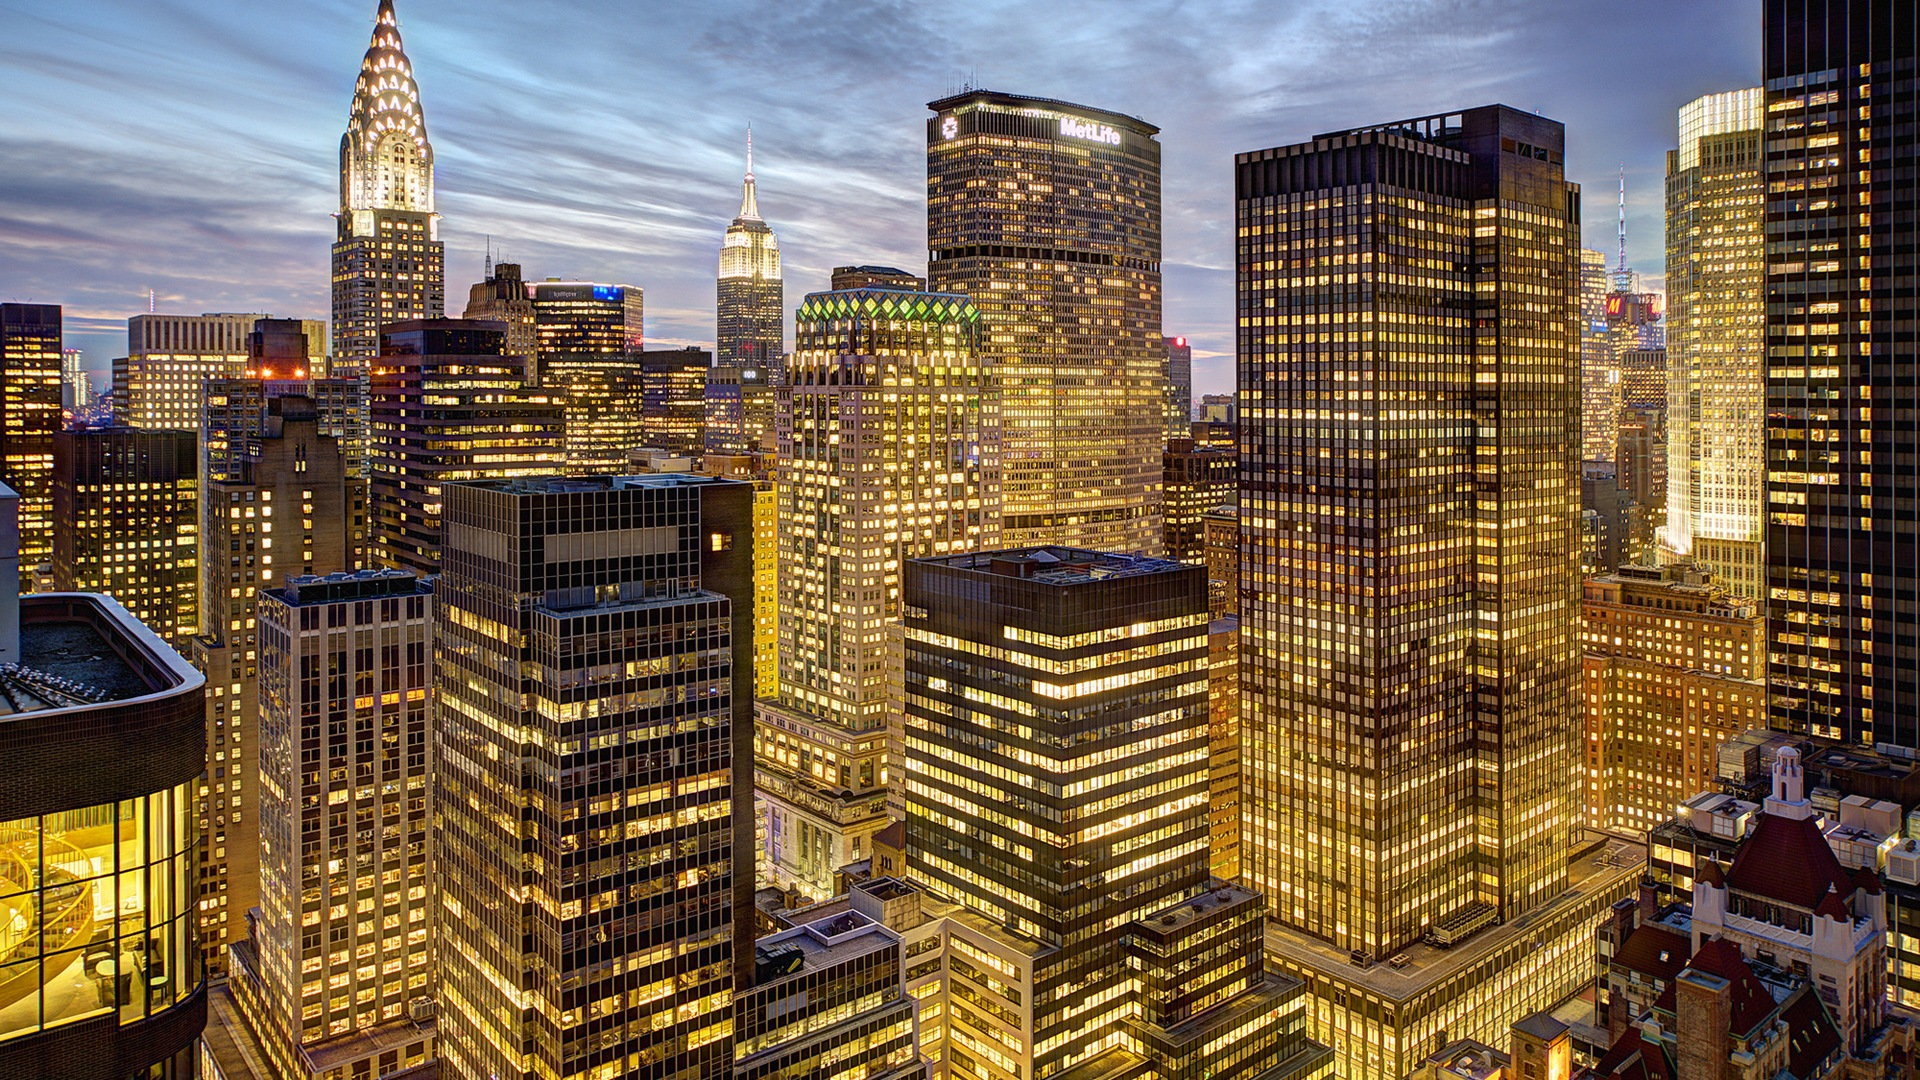 Empire state building new york ville la nuit fonds d for Ville a new york